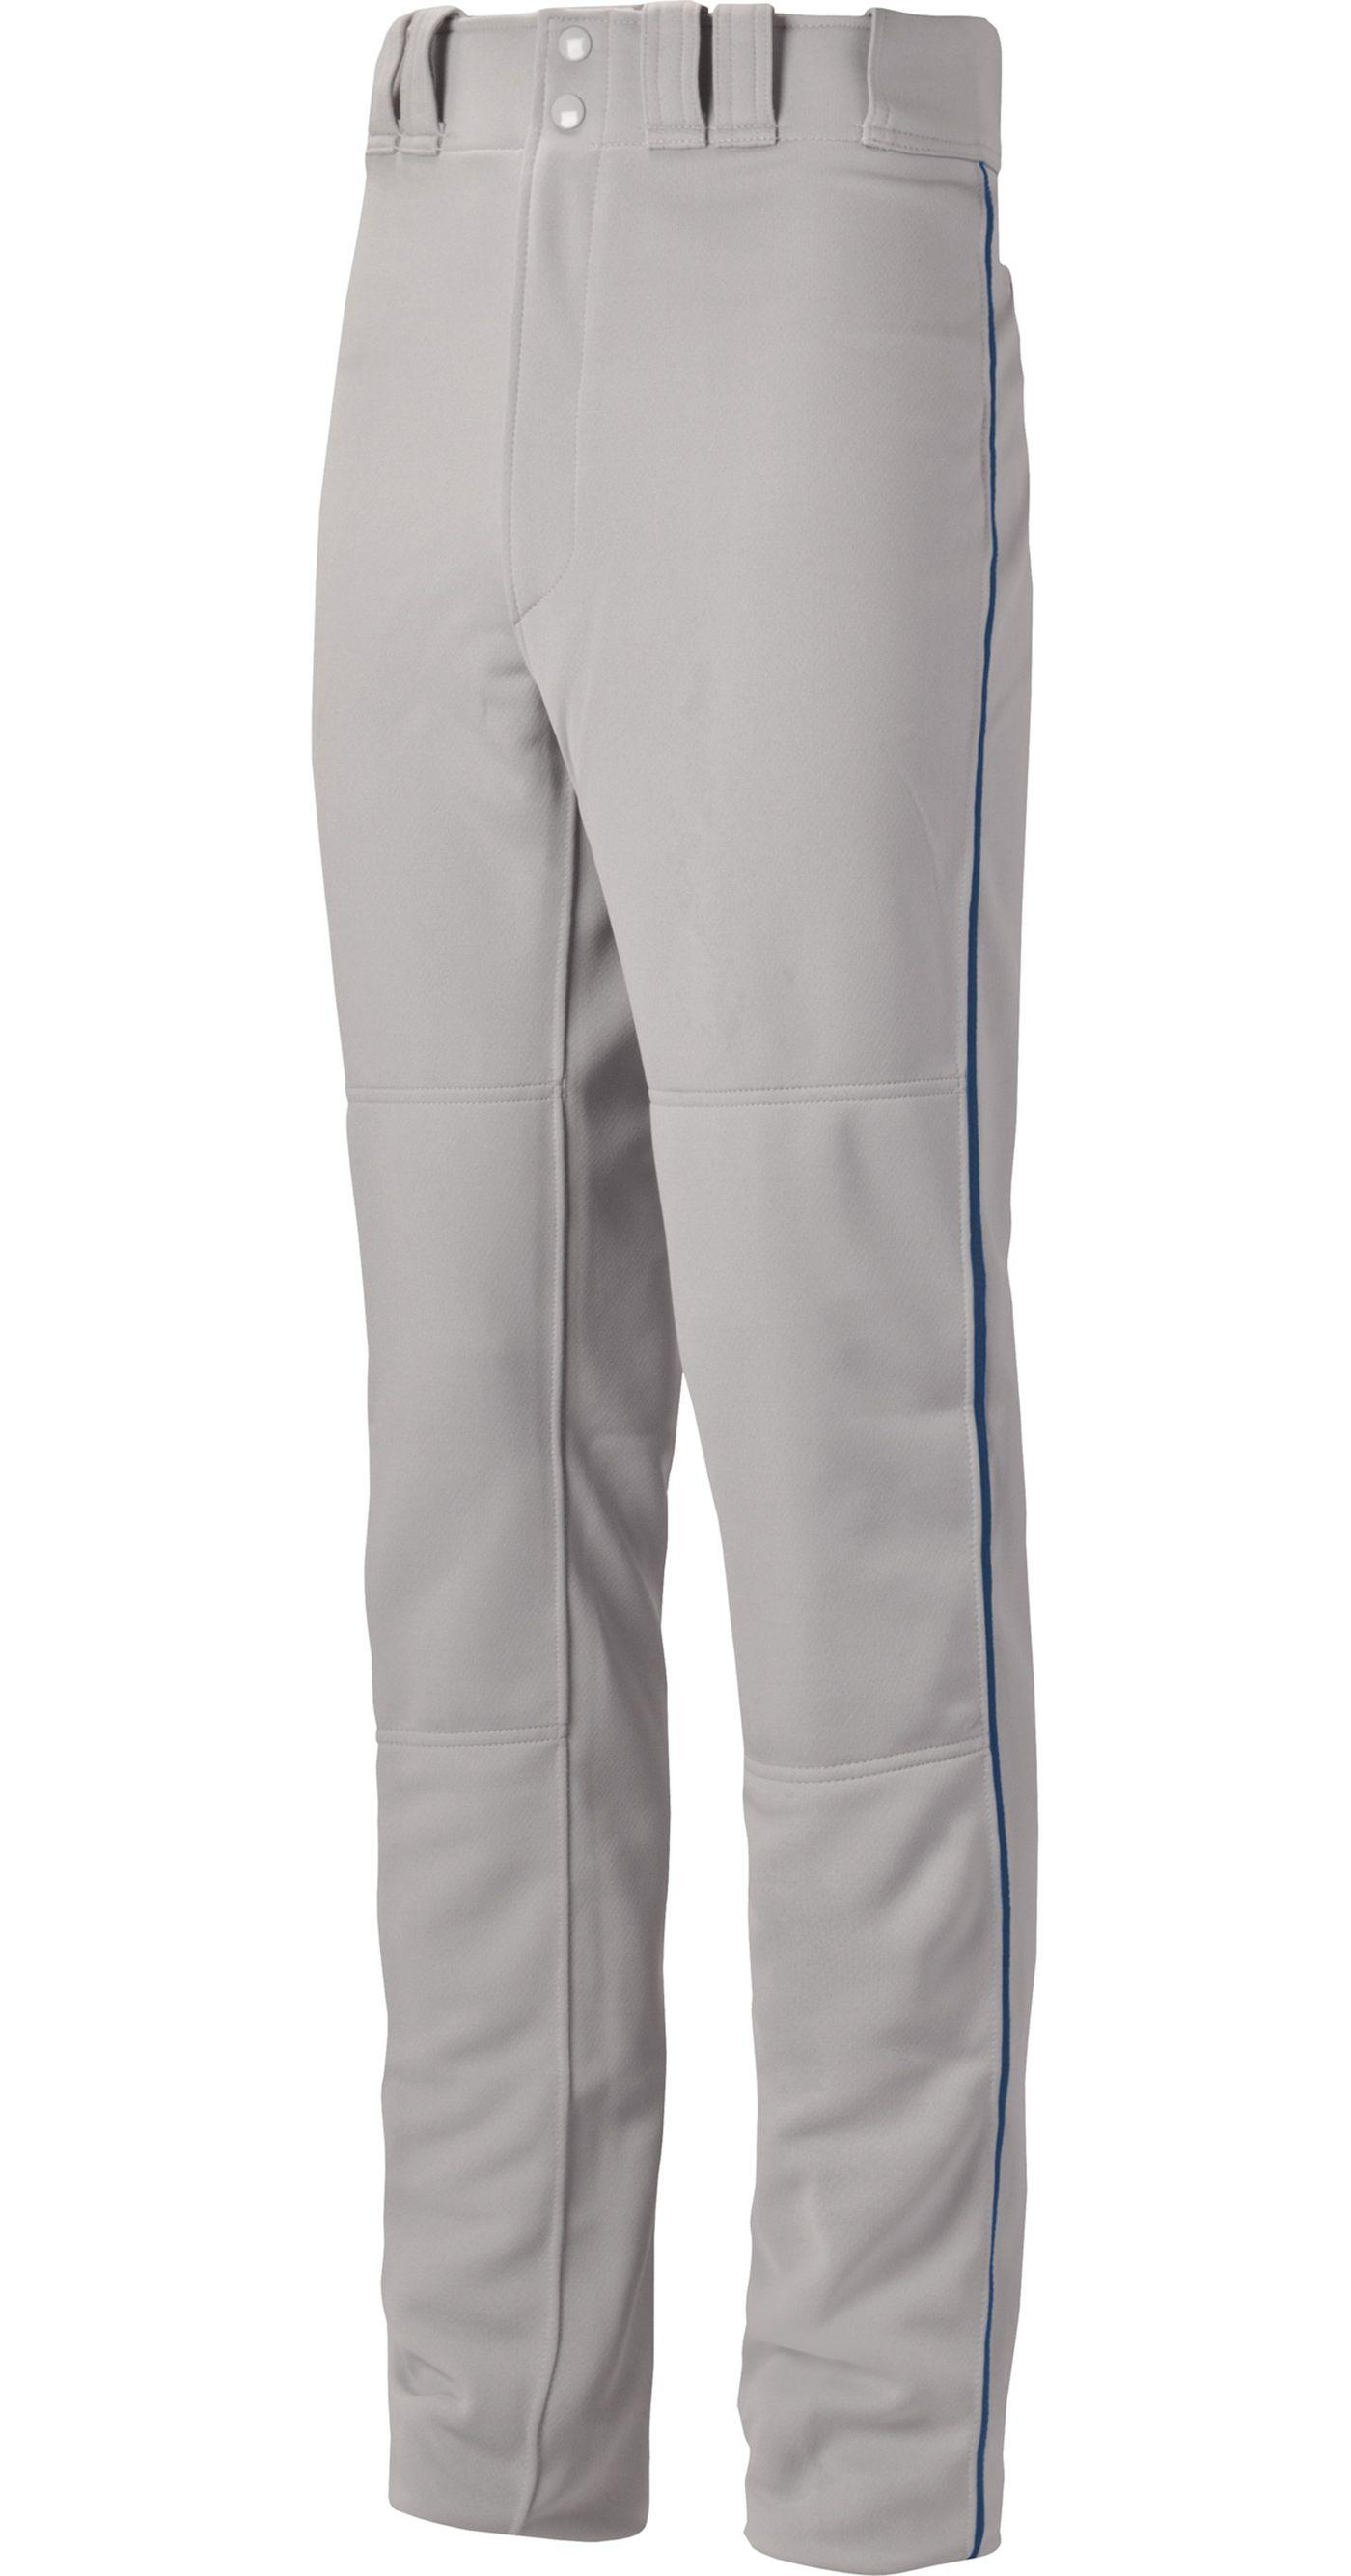 Mizuno Boys' Select Pro Piped Baseball Pants